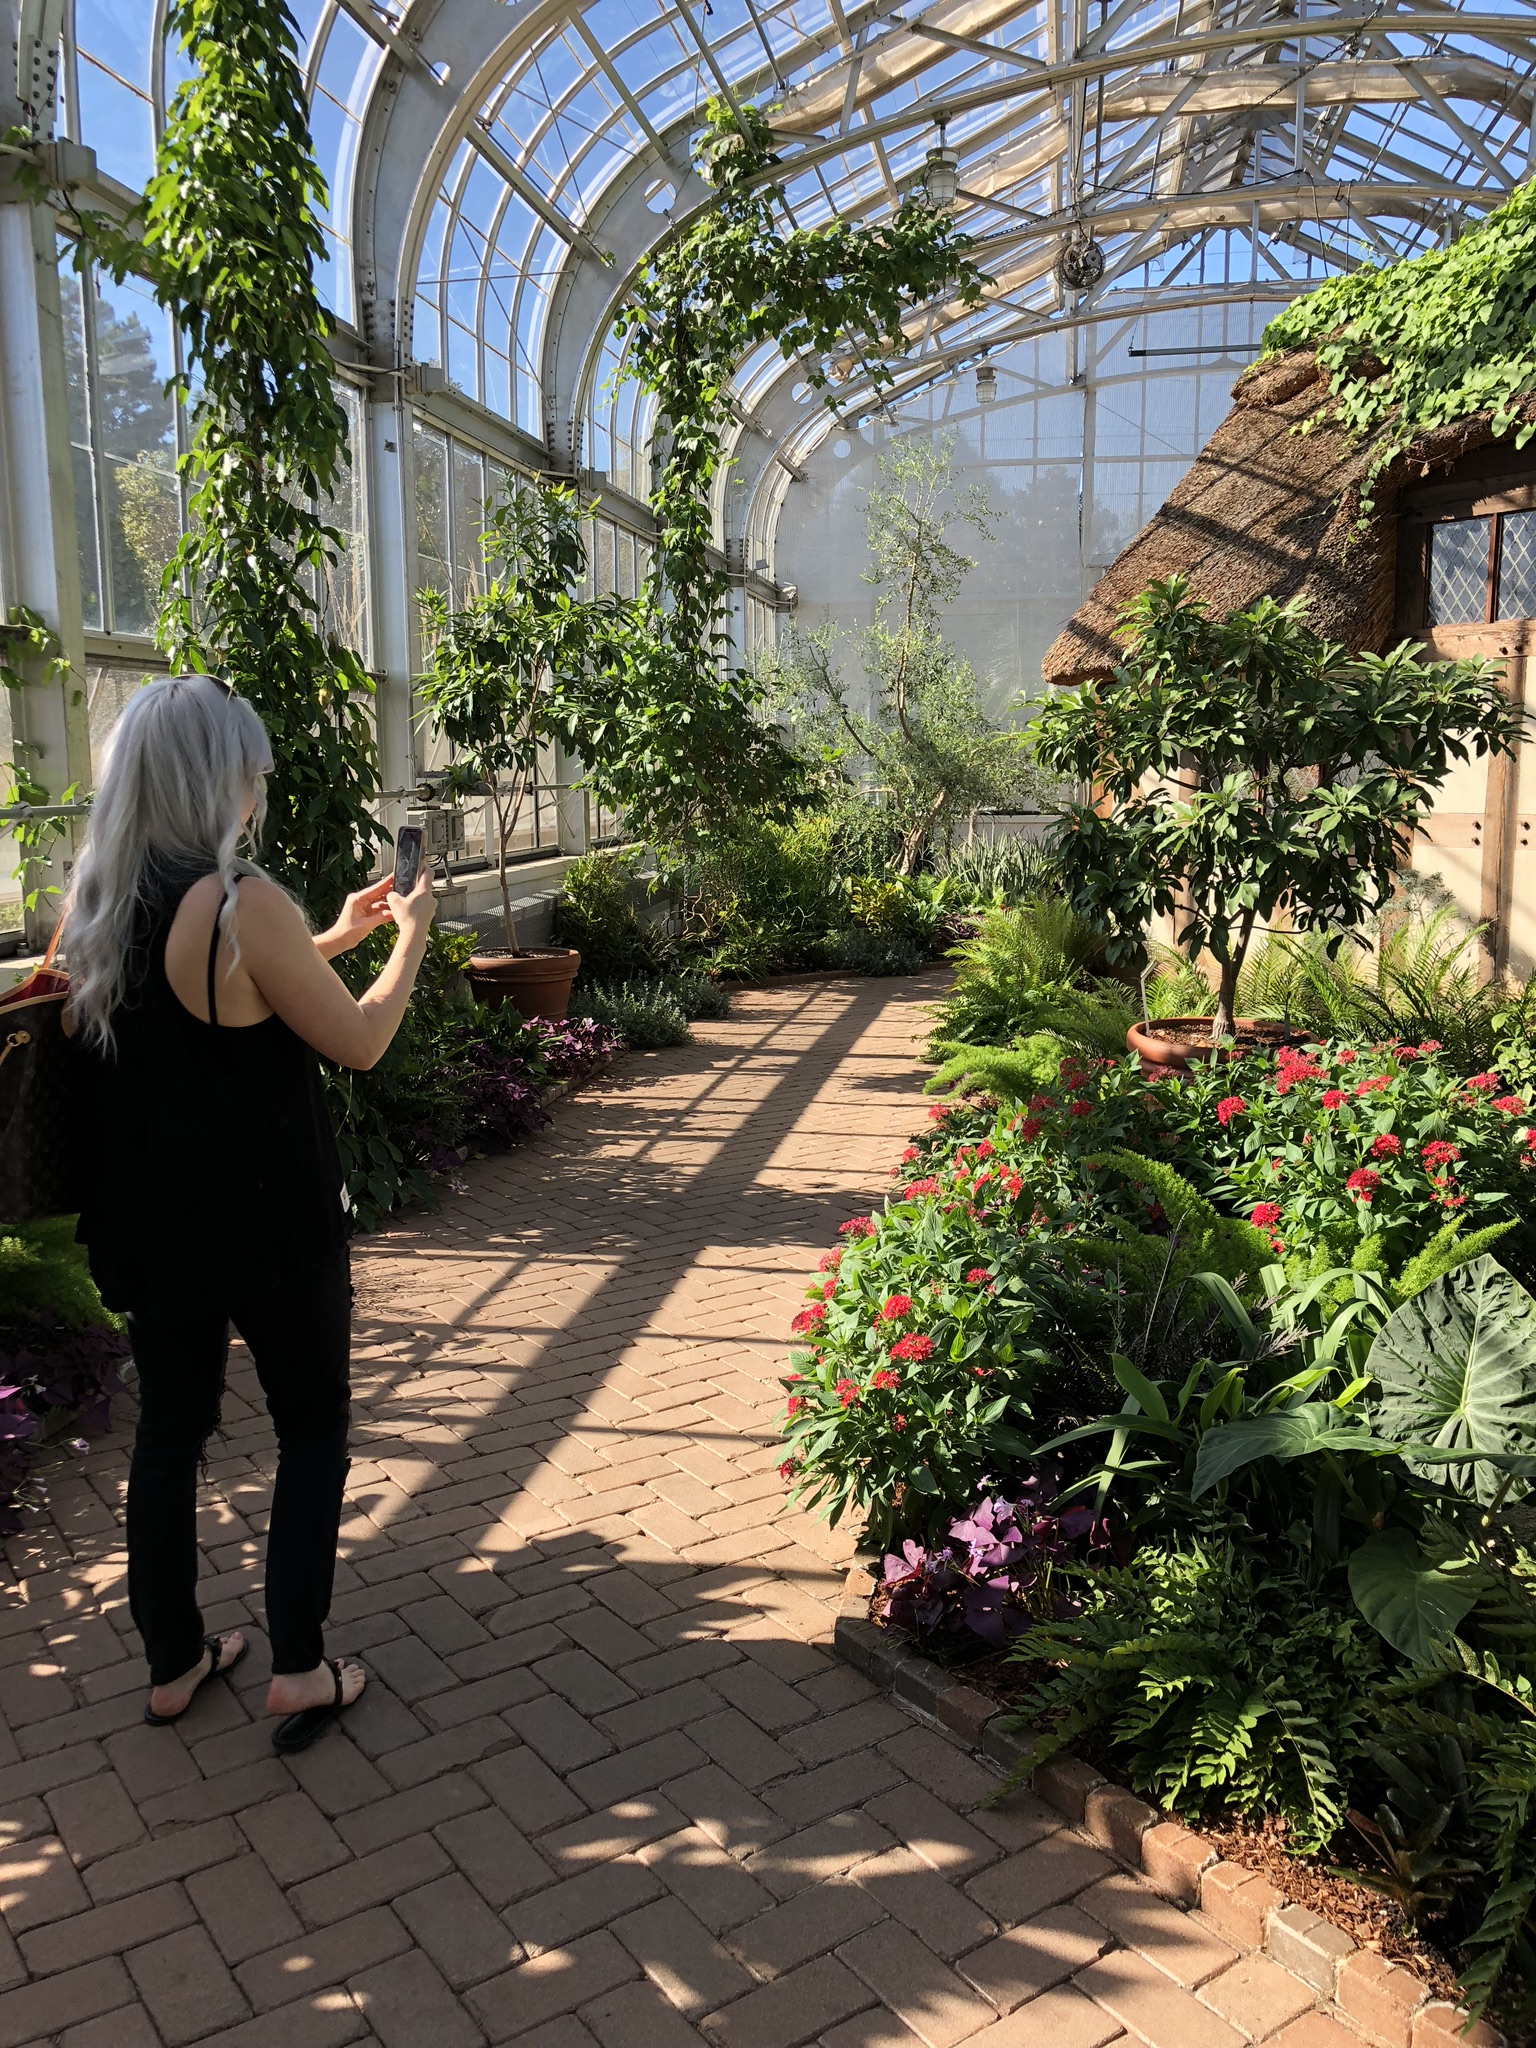 chic stripes lewis ginter botanical gardens